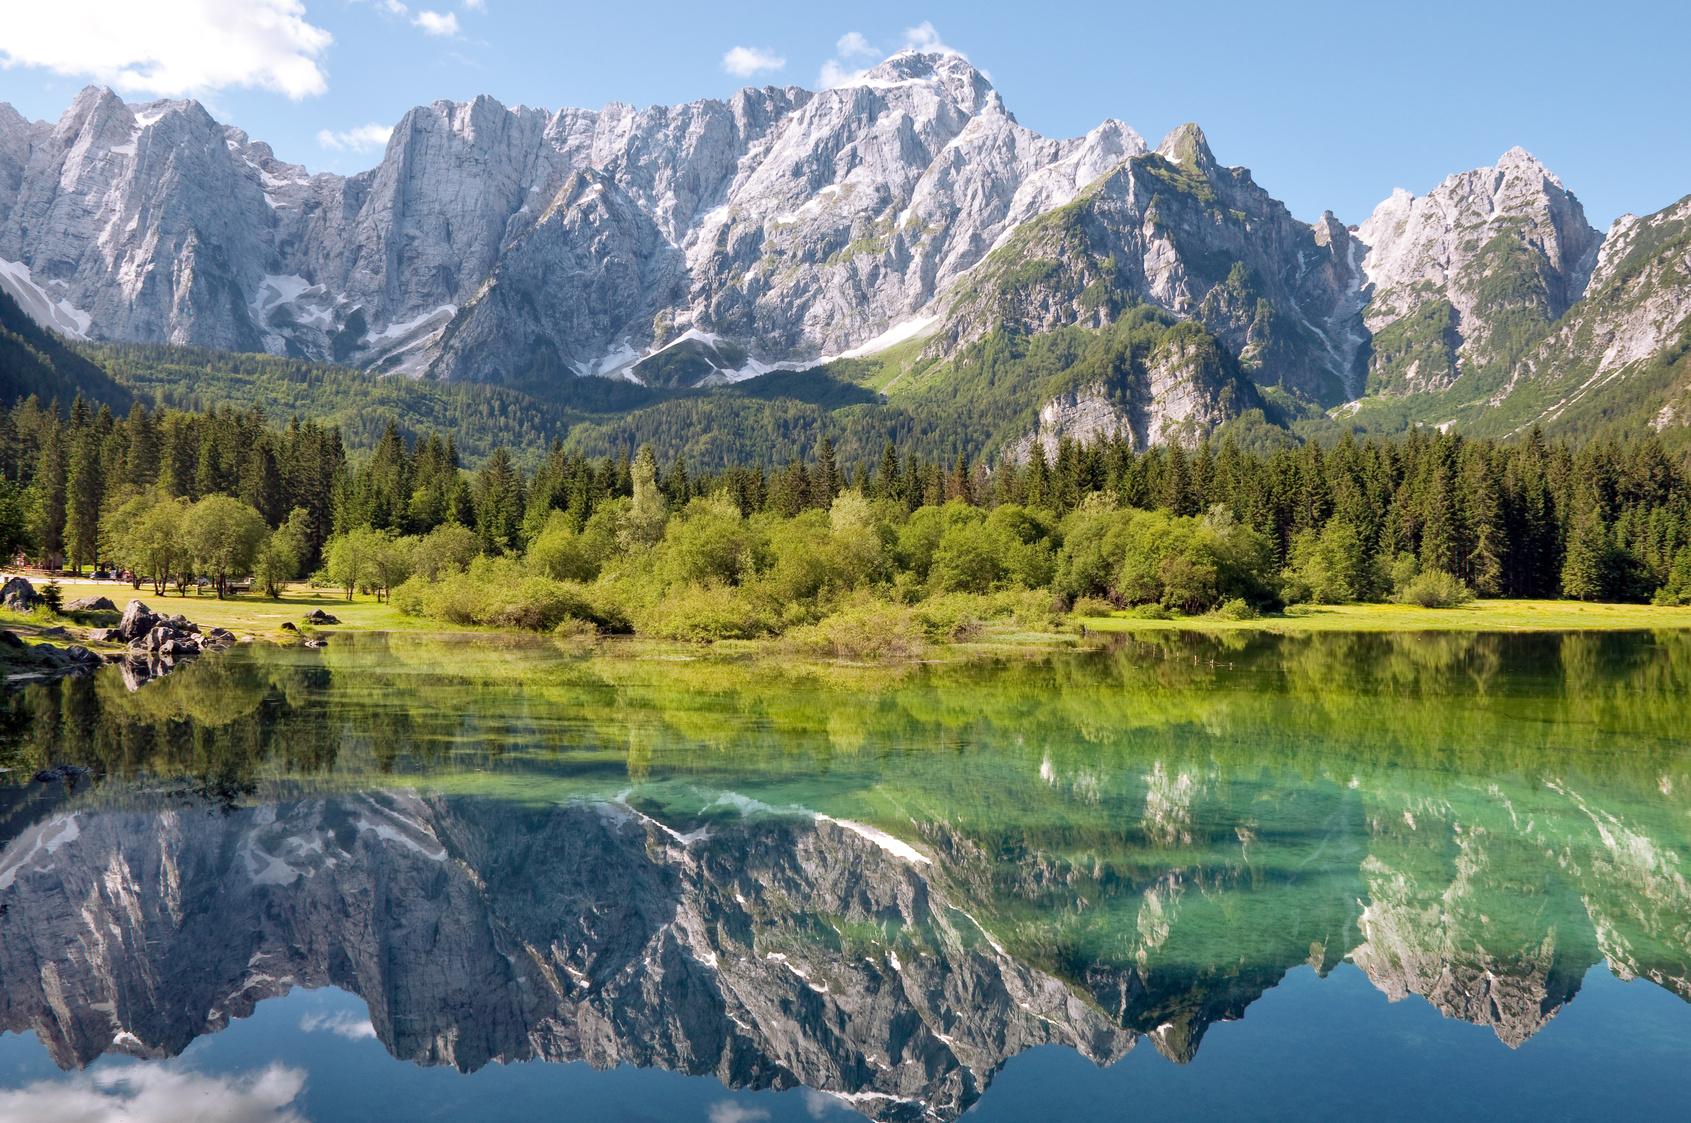 Italia - Udine - Lago di Fusine and monte Mangart reflex on lake